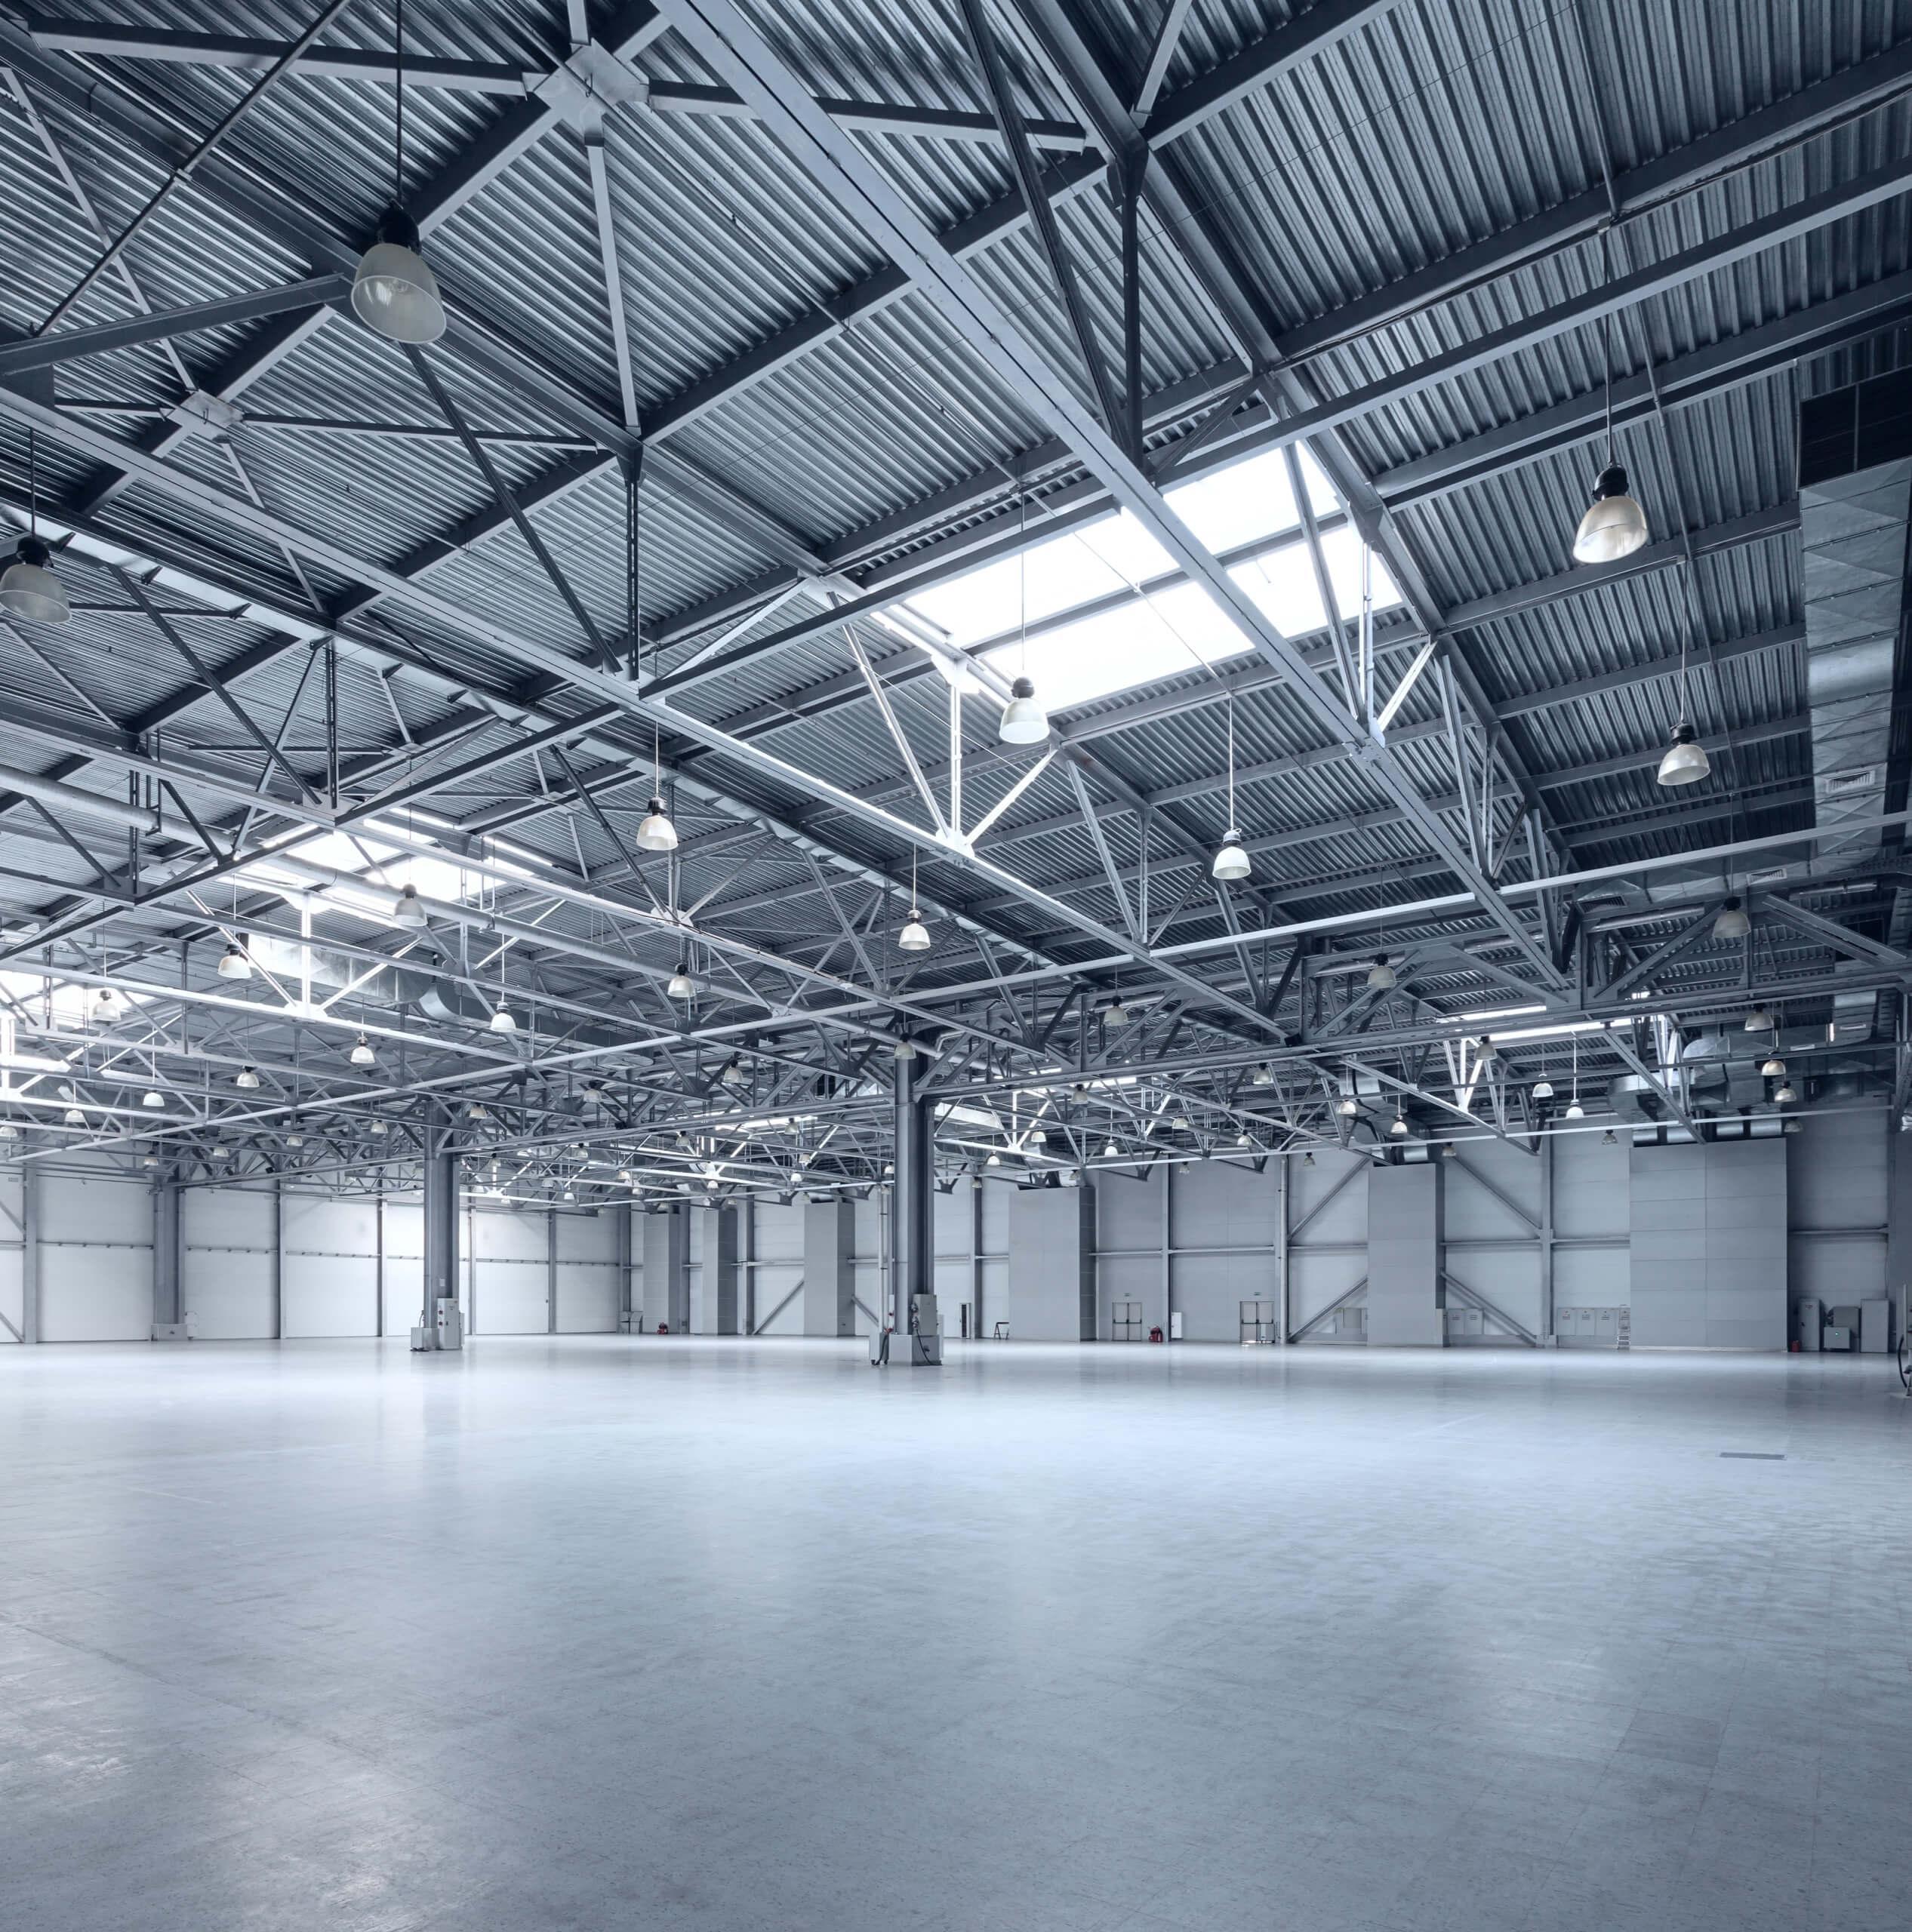 Large garage rafters